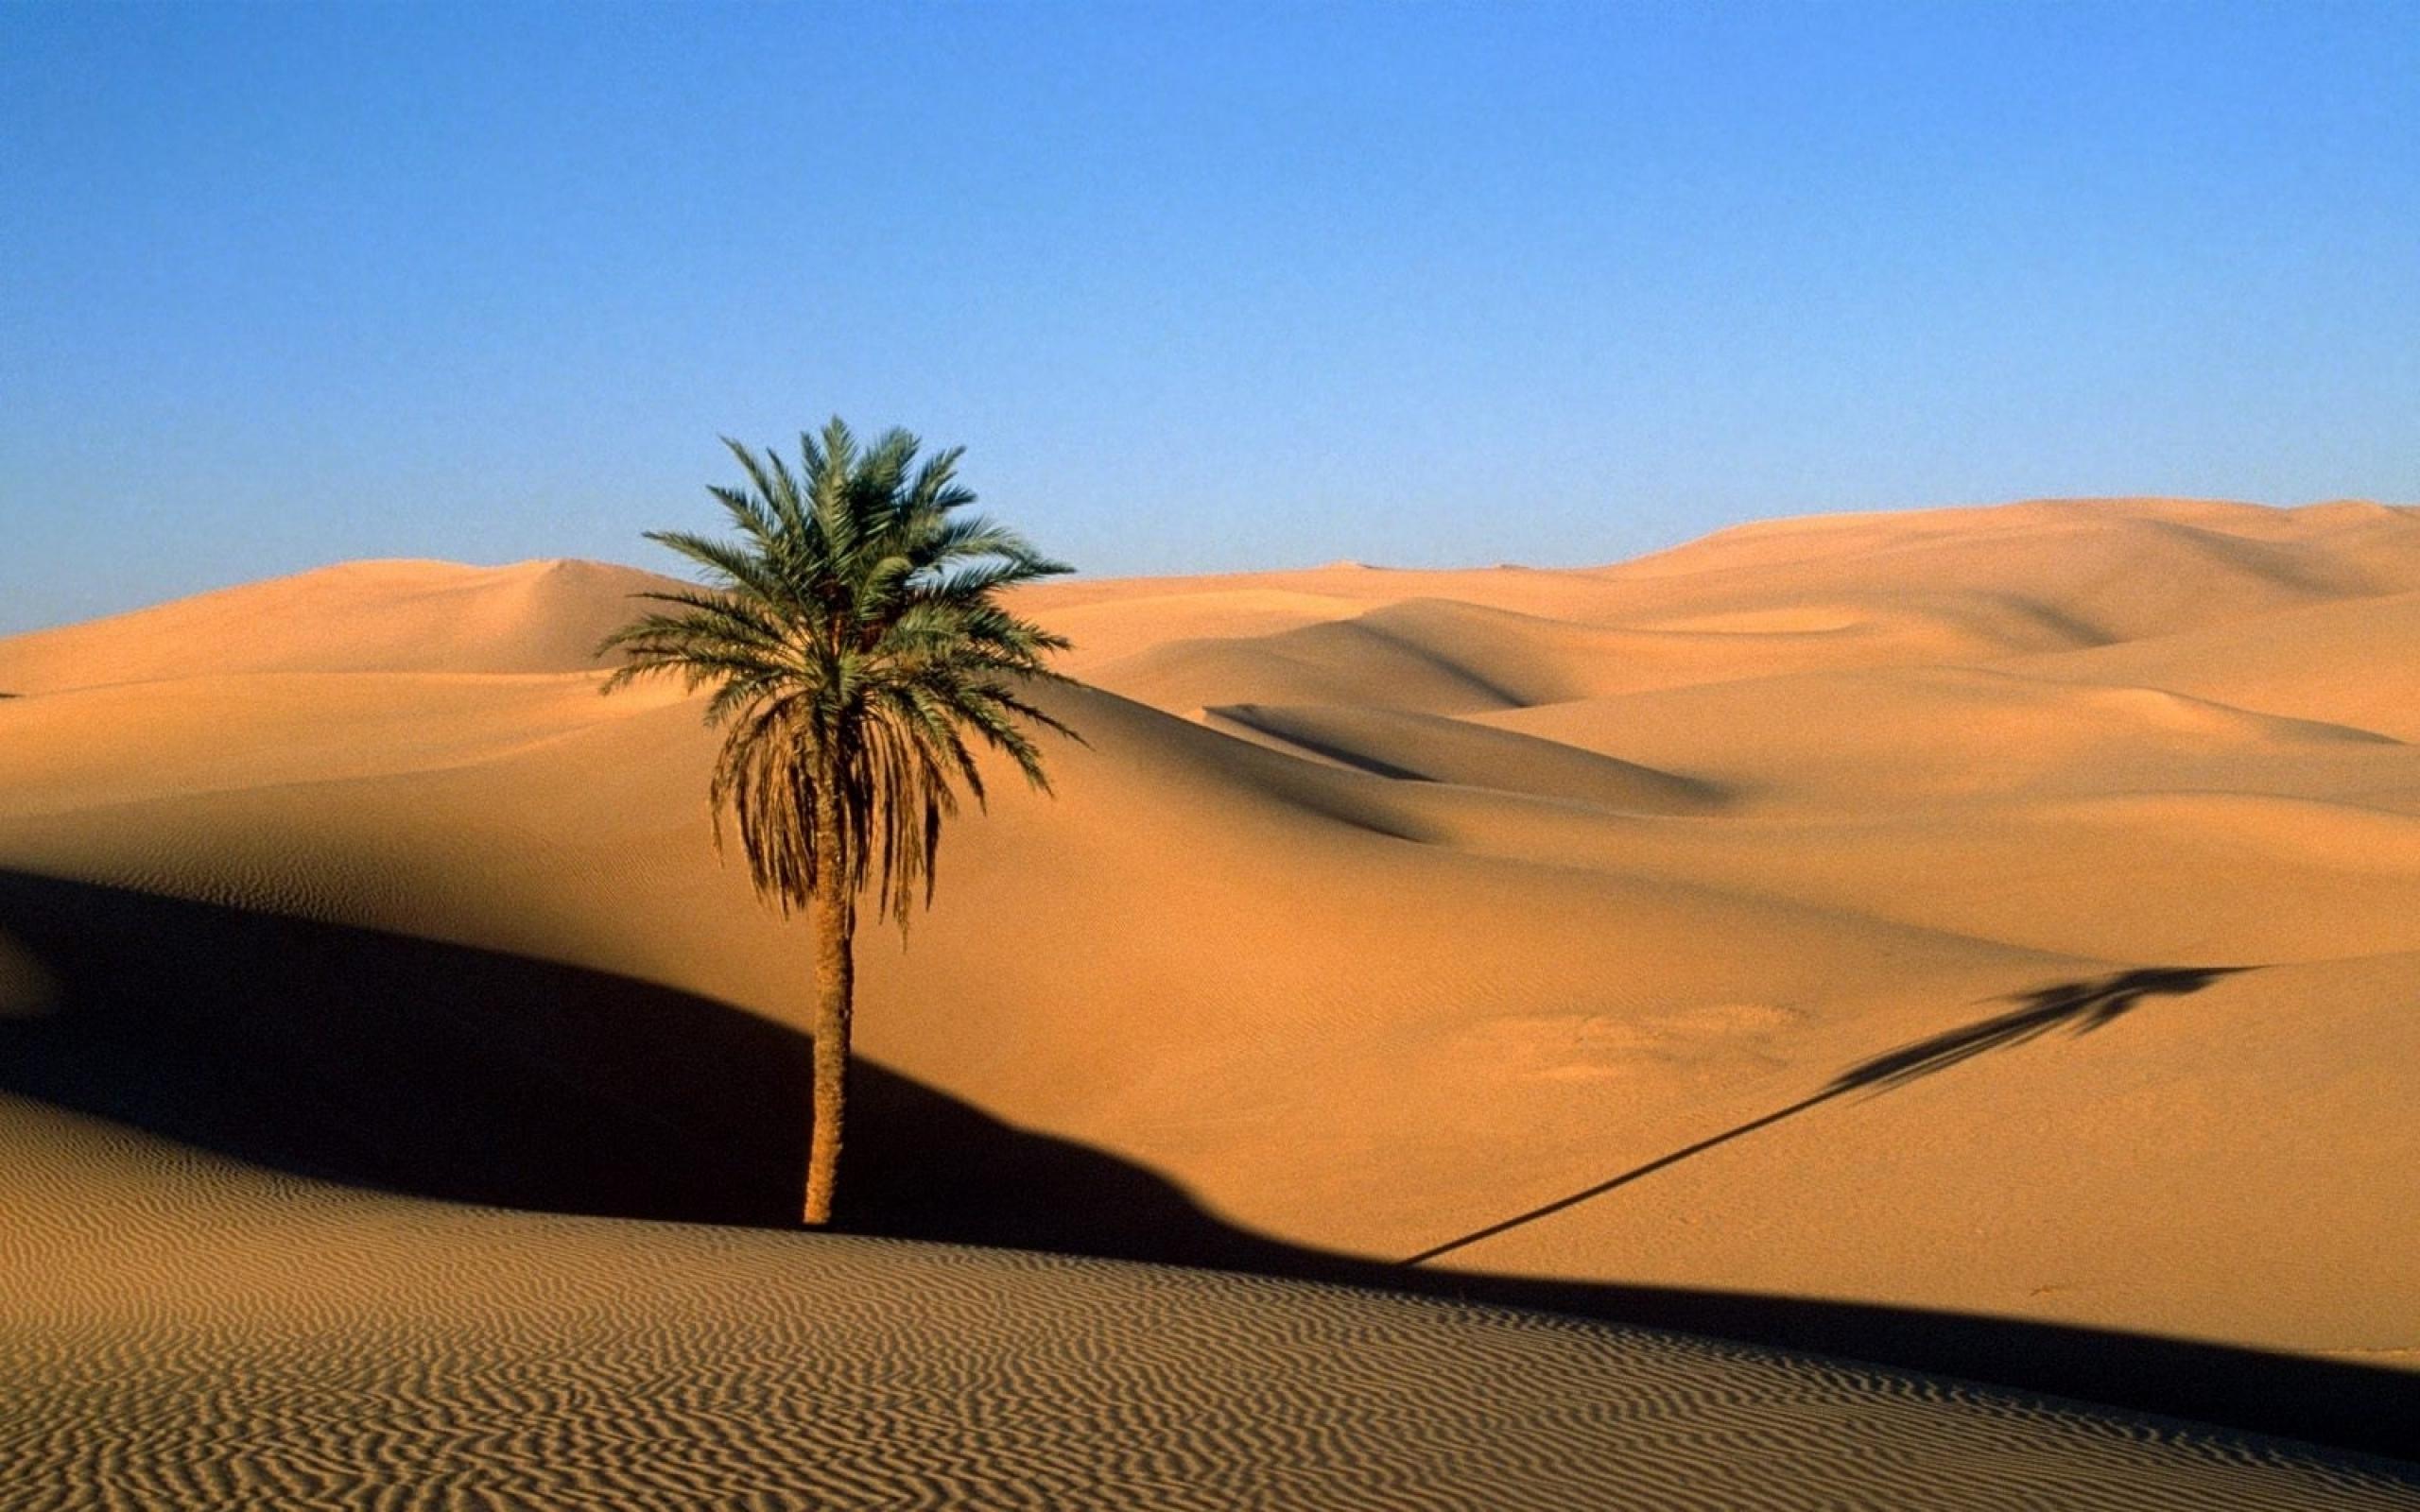 Free Download Alpha Coders Wallpaper Abyss Earth Desert